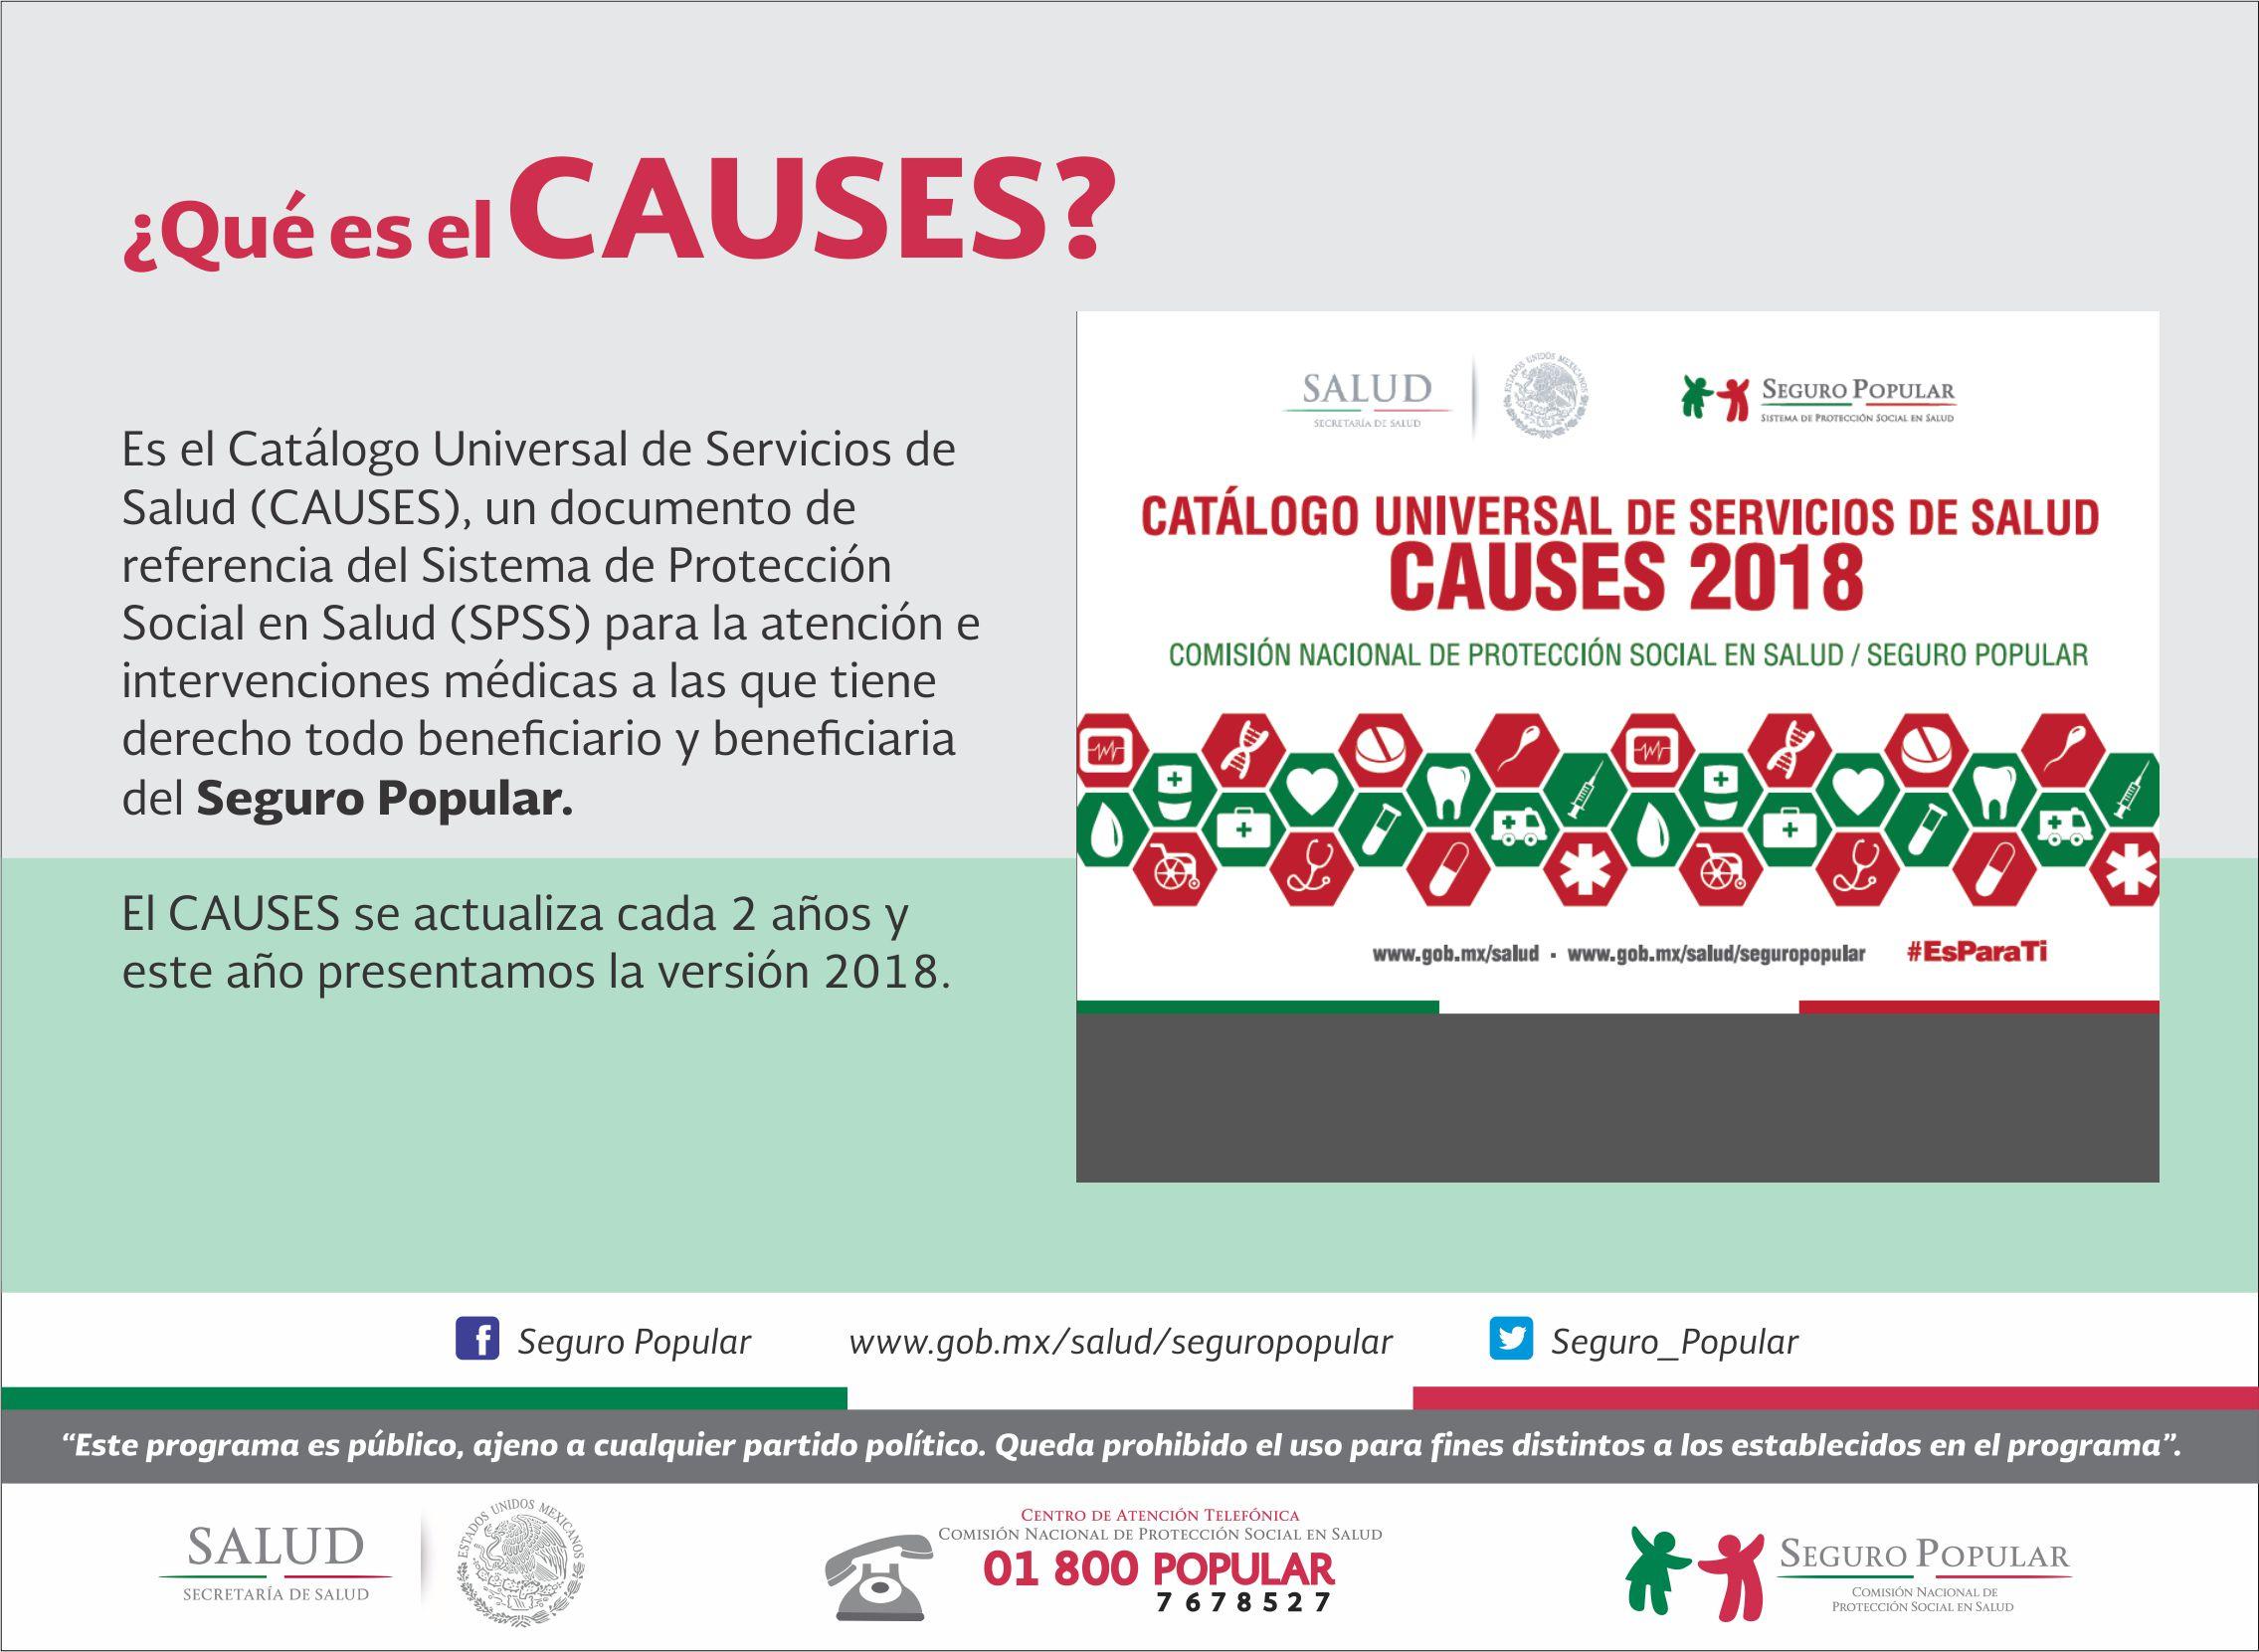 Catálogo Universal de Servicios de Salud (CAUSES) 2018.